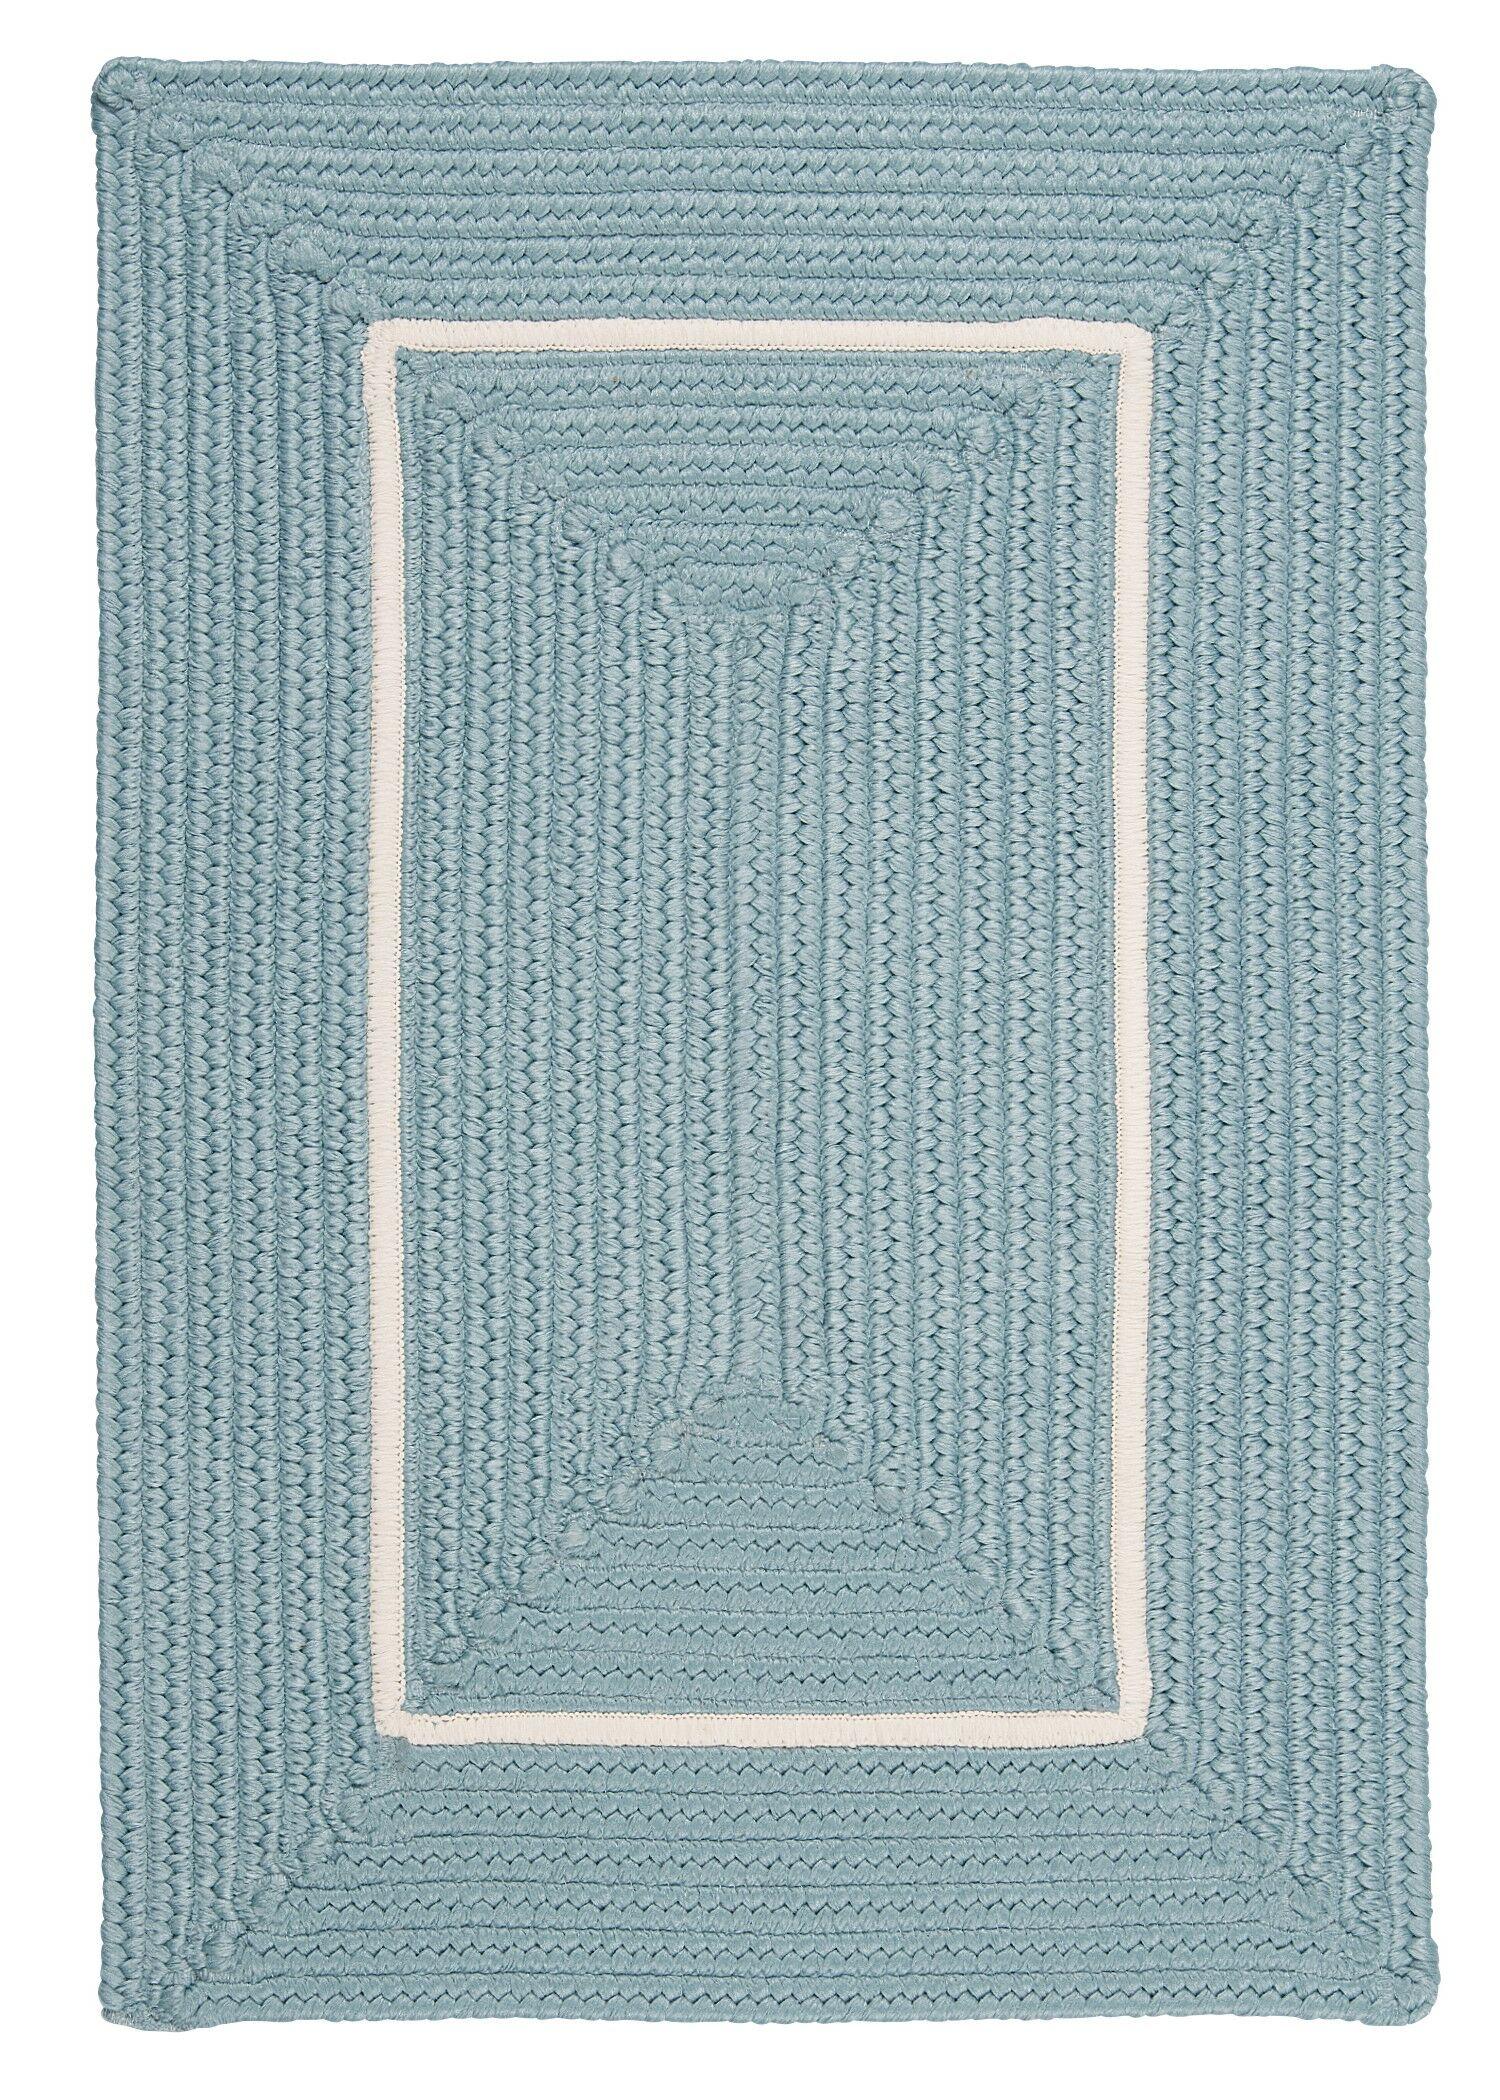 Doodle Edge Light Blue Border in Border Indoor/Outdoor Area Rug Rug Size: 4' x 6'